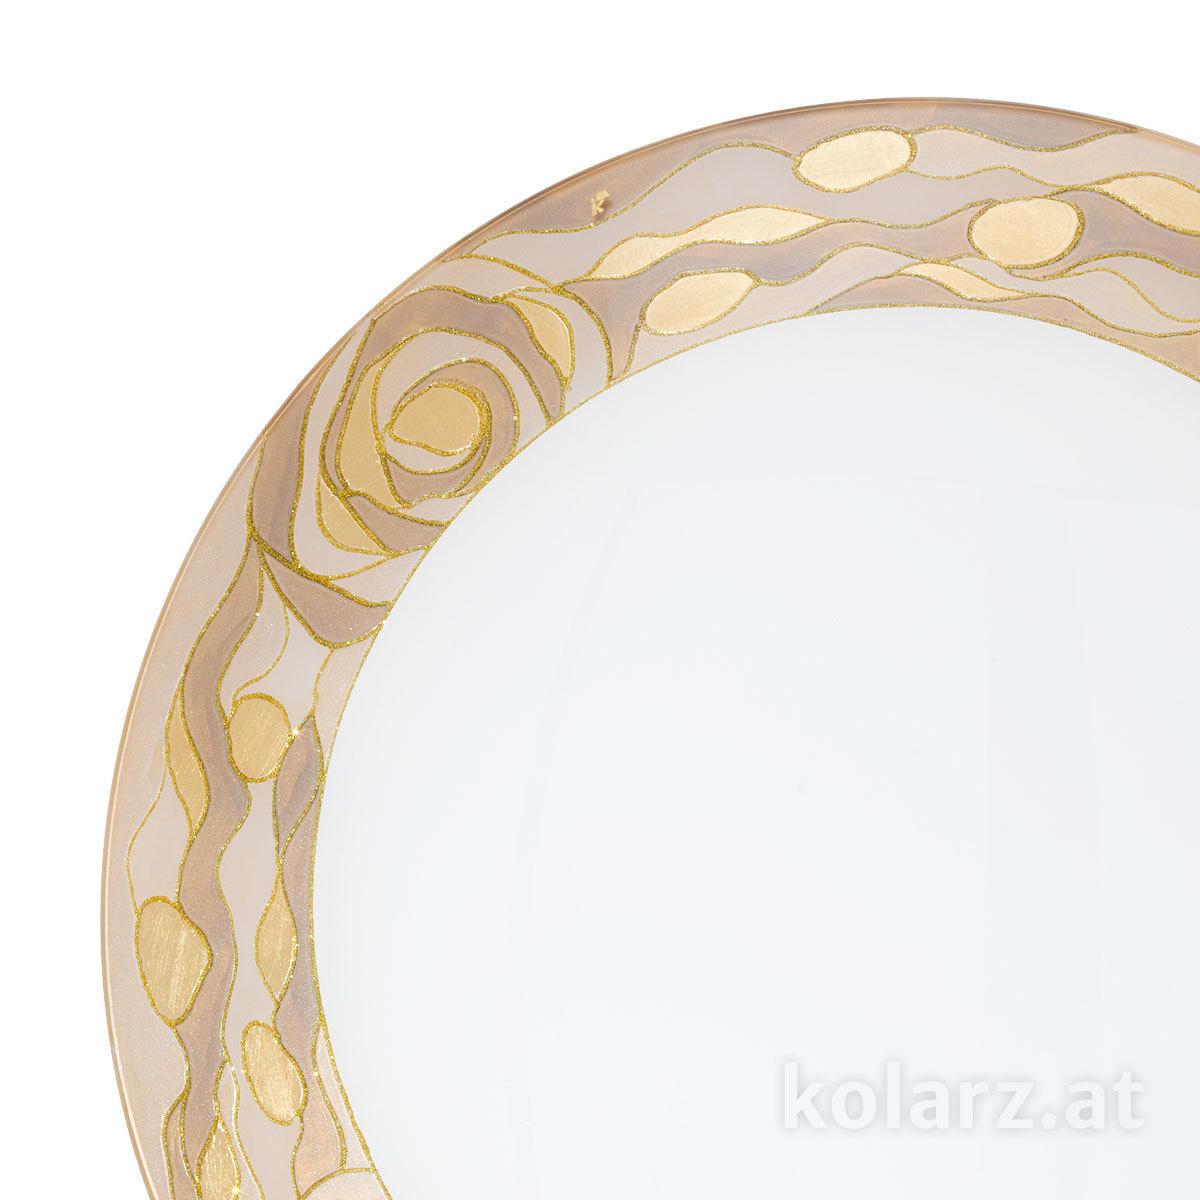 deckenleuchte serena aqua champagne 40 24 karat gold. Black Bedroom Furniture Sets. Home Design Ideas